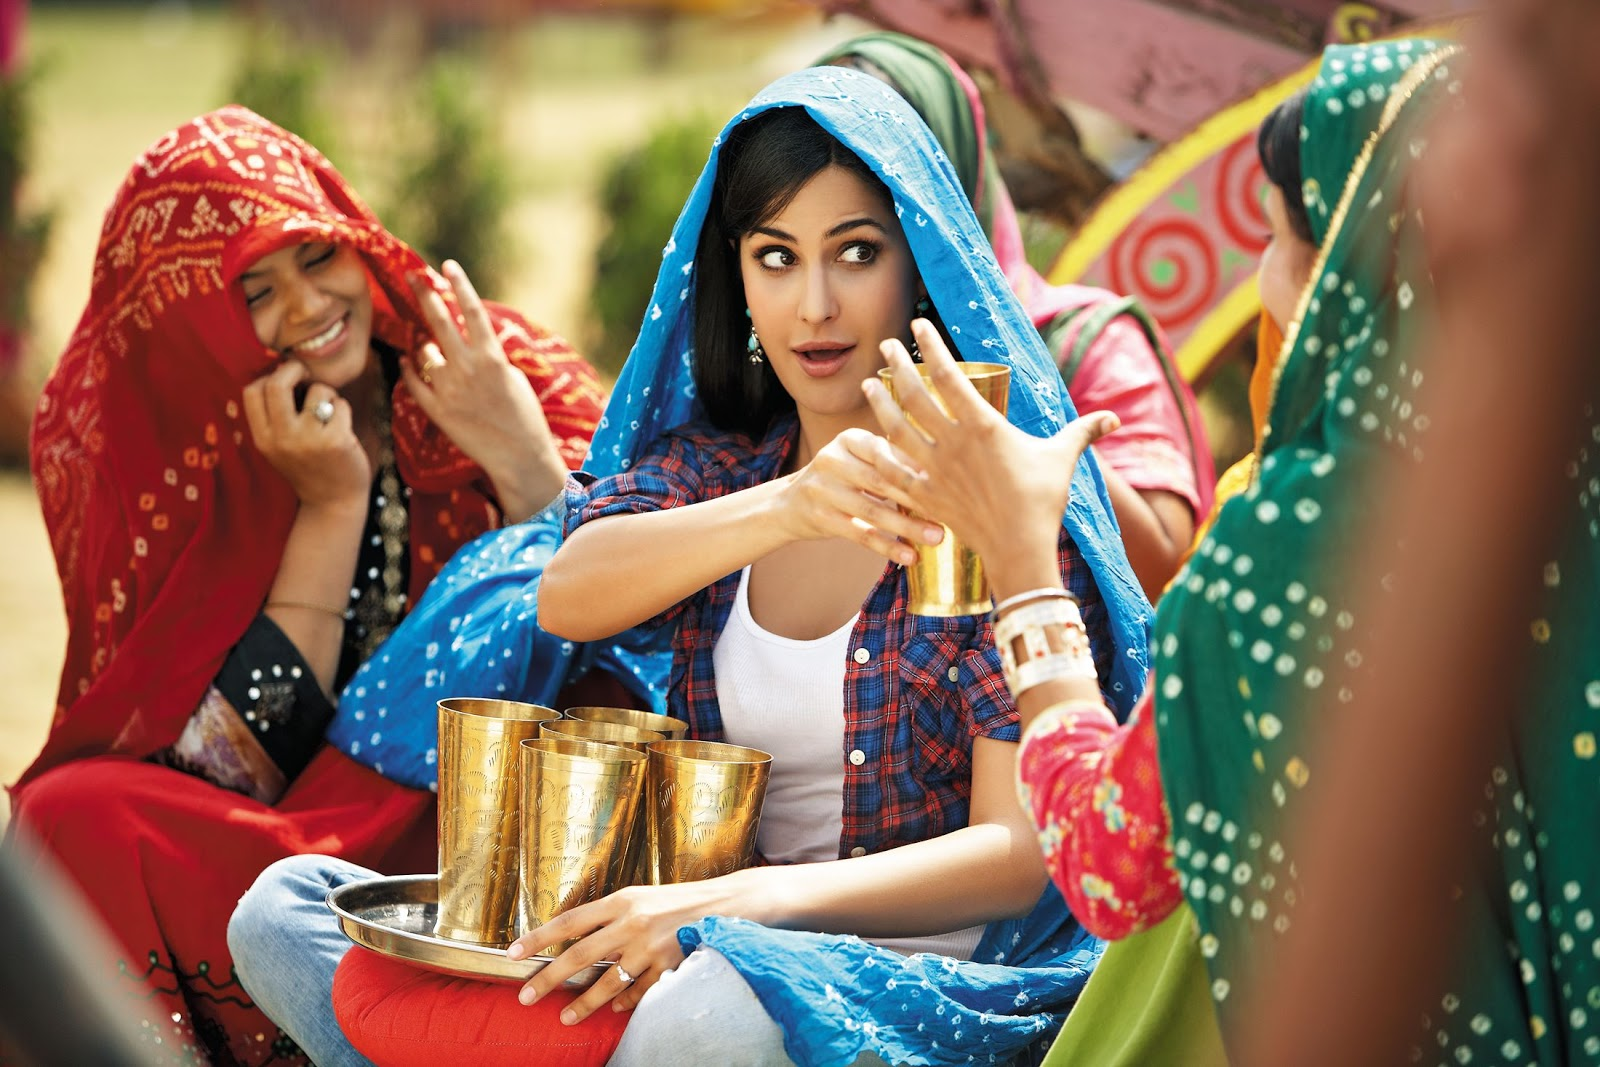 High Quality Bollywood Celebrity Pictures Katrina Kaif -5863